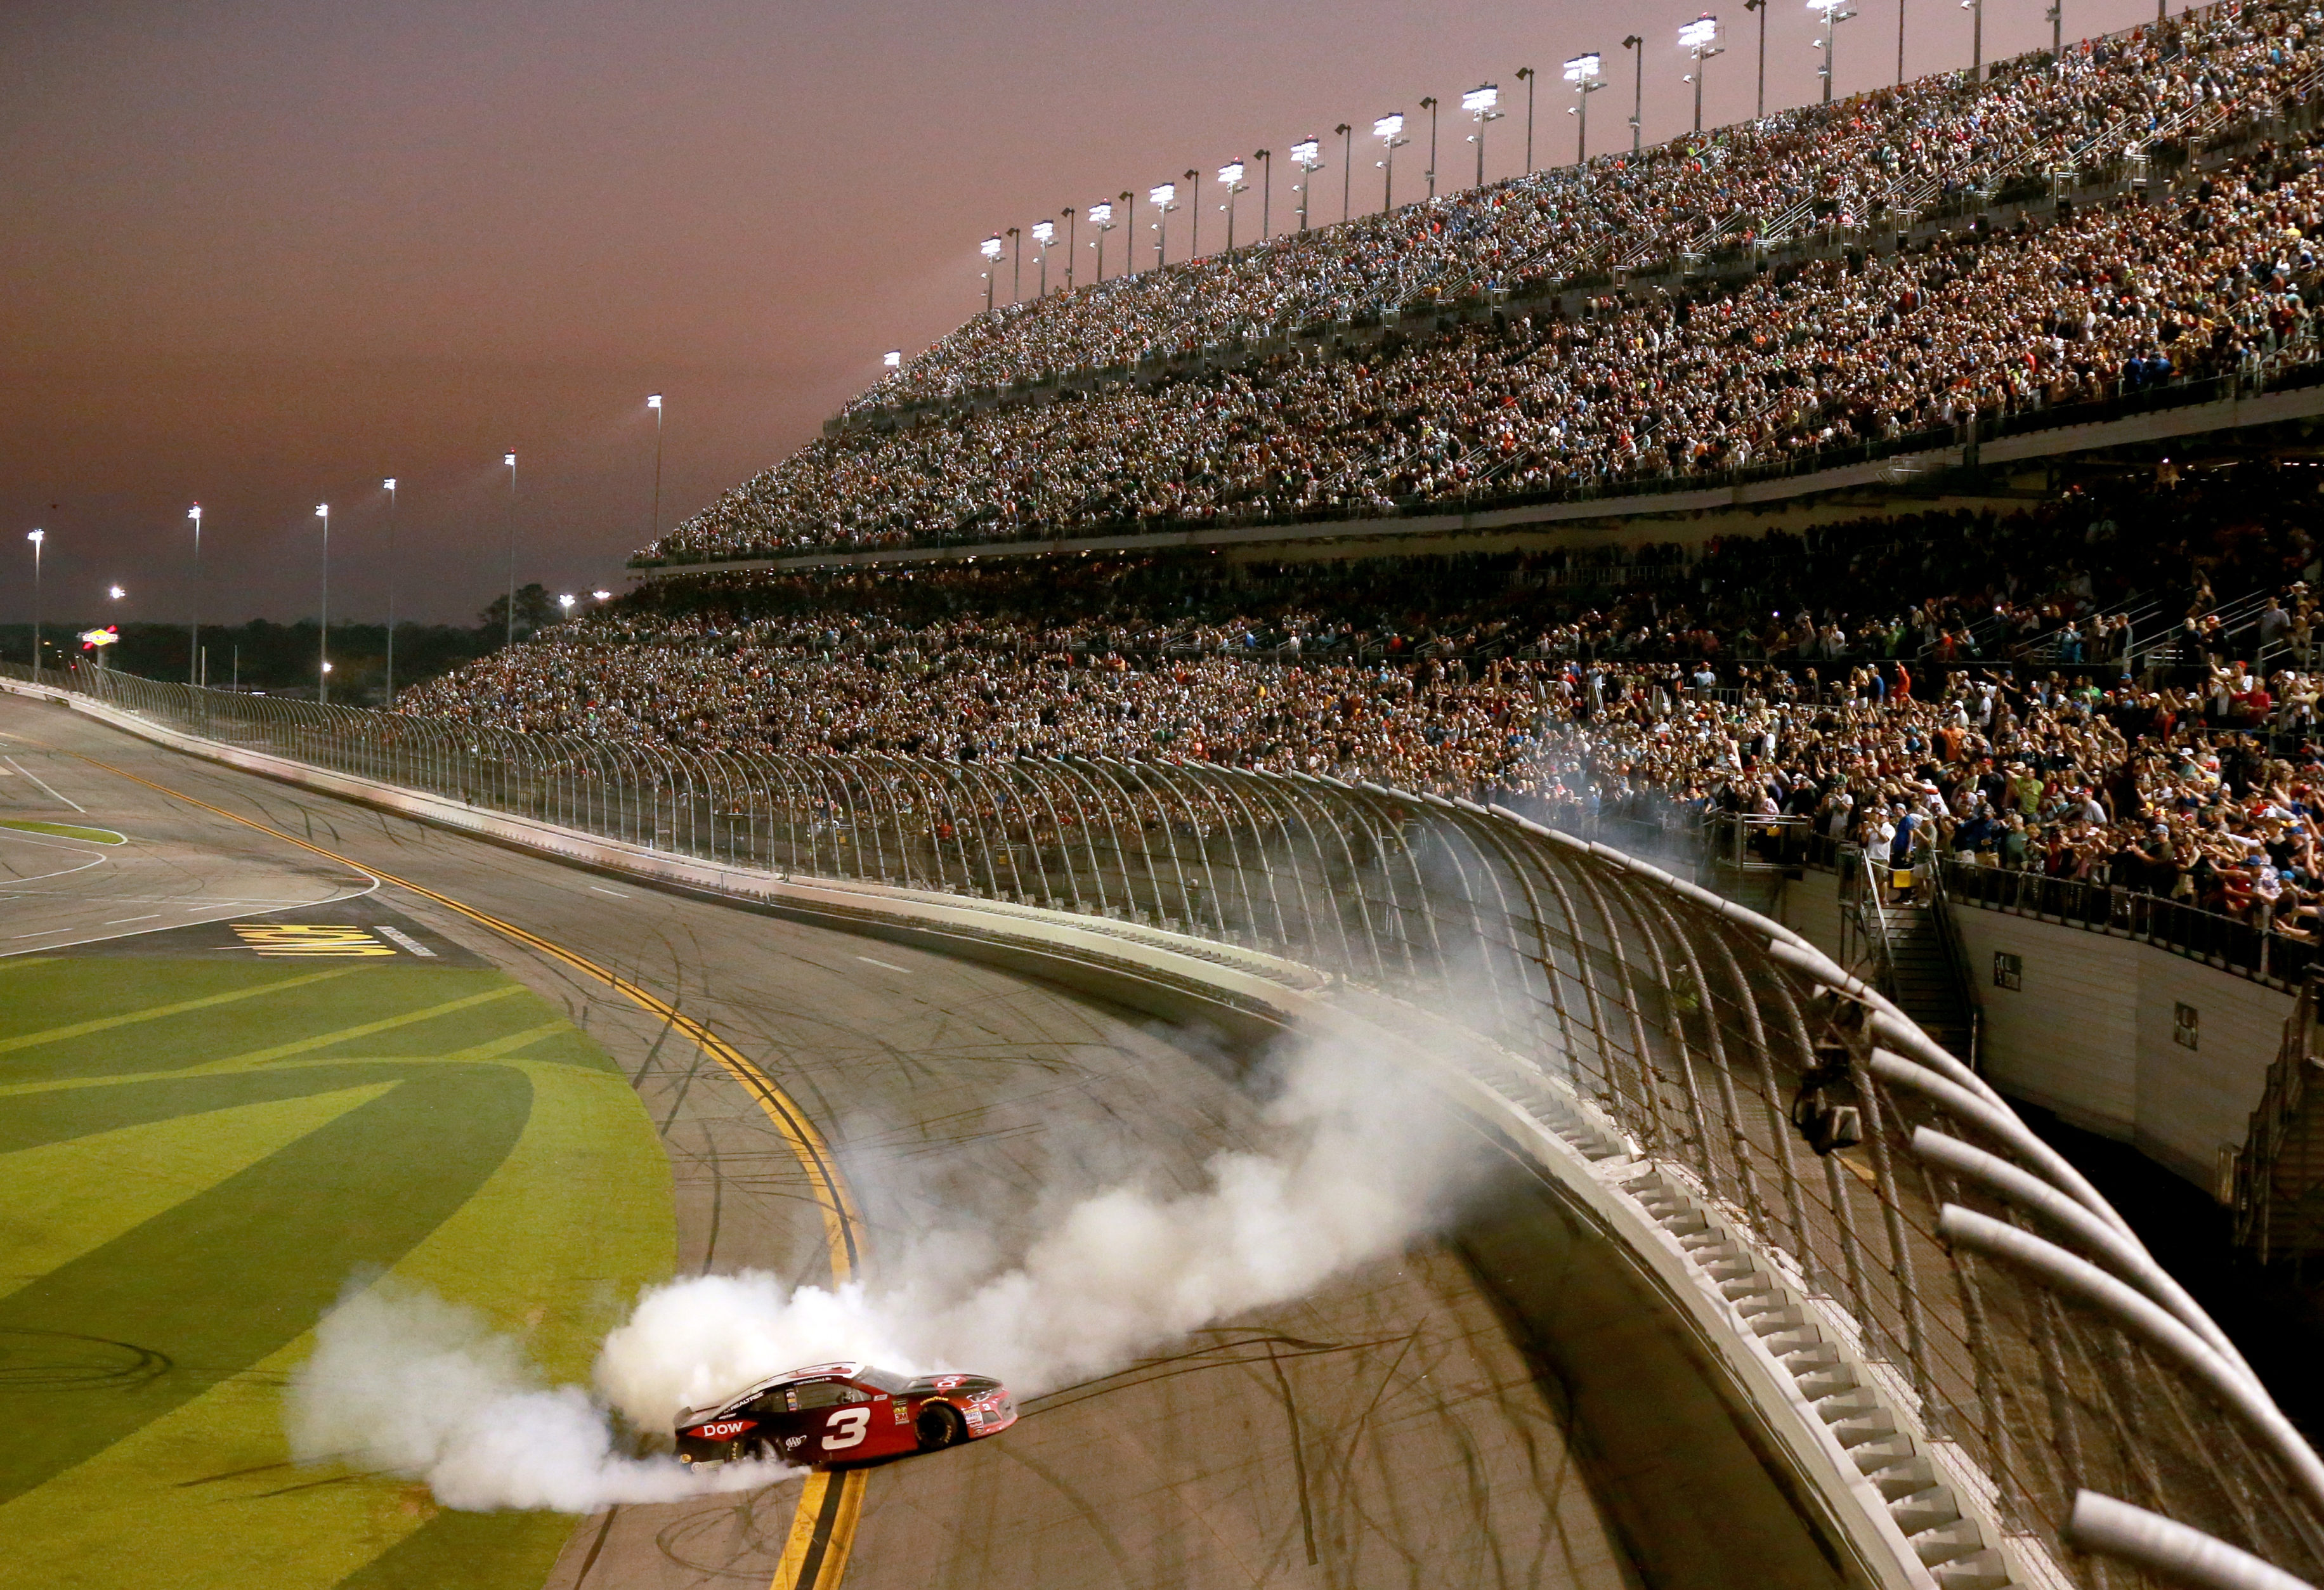 Austin Dillon wins the Daytona 500